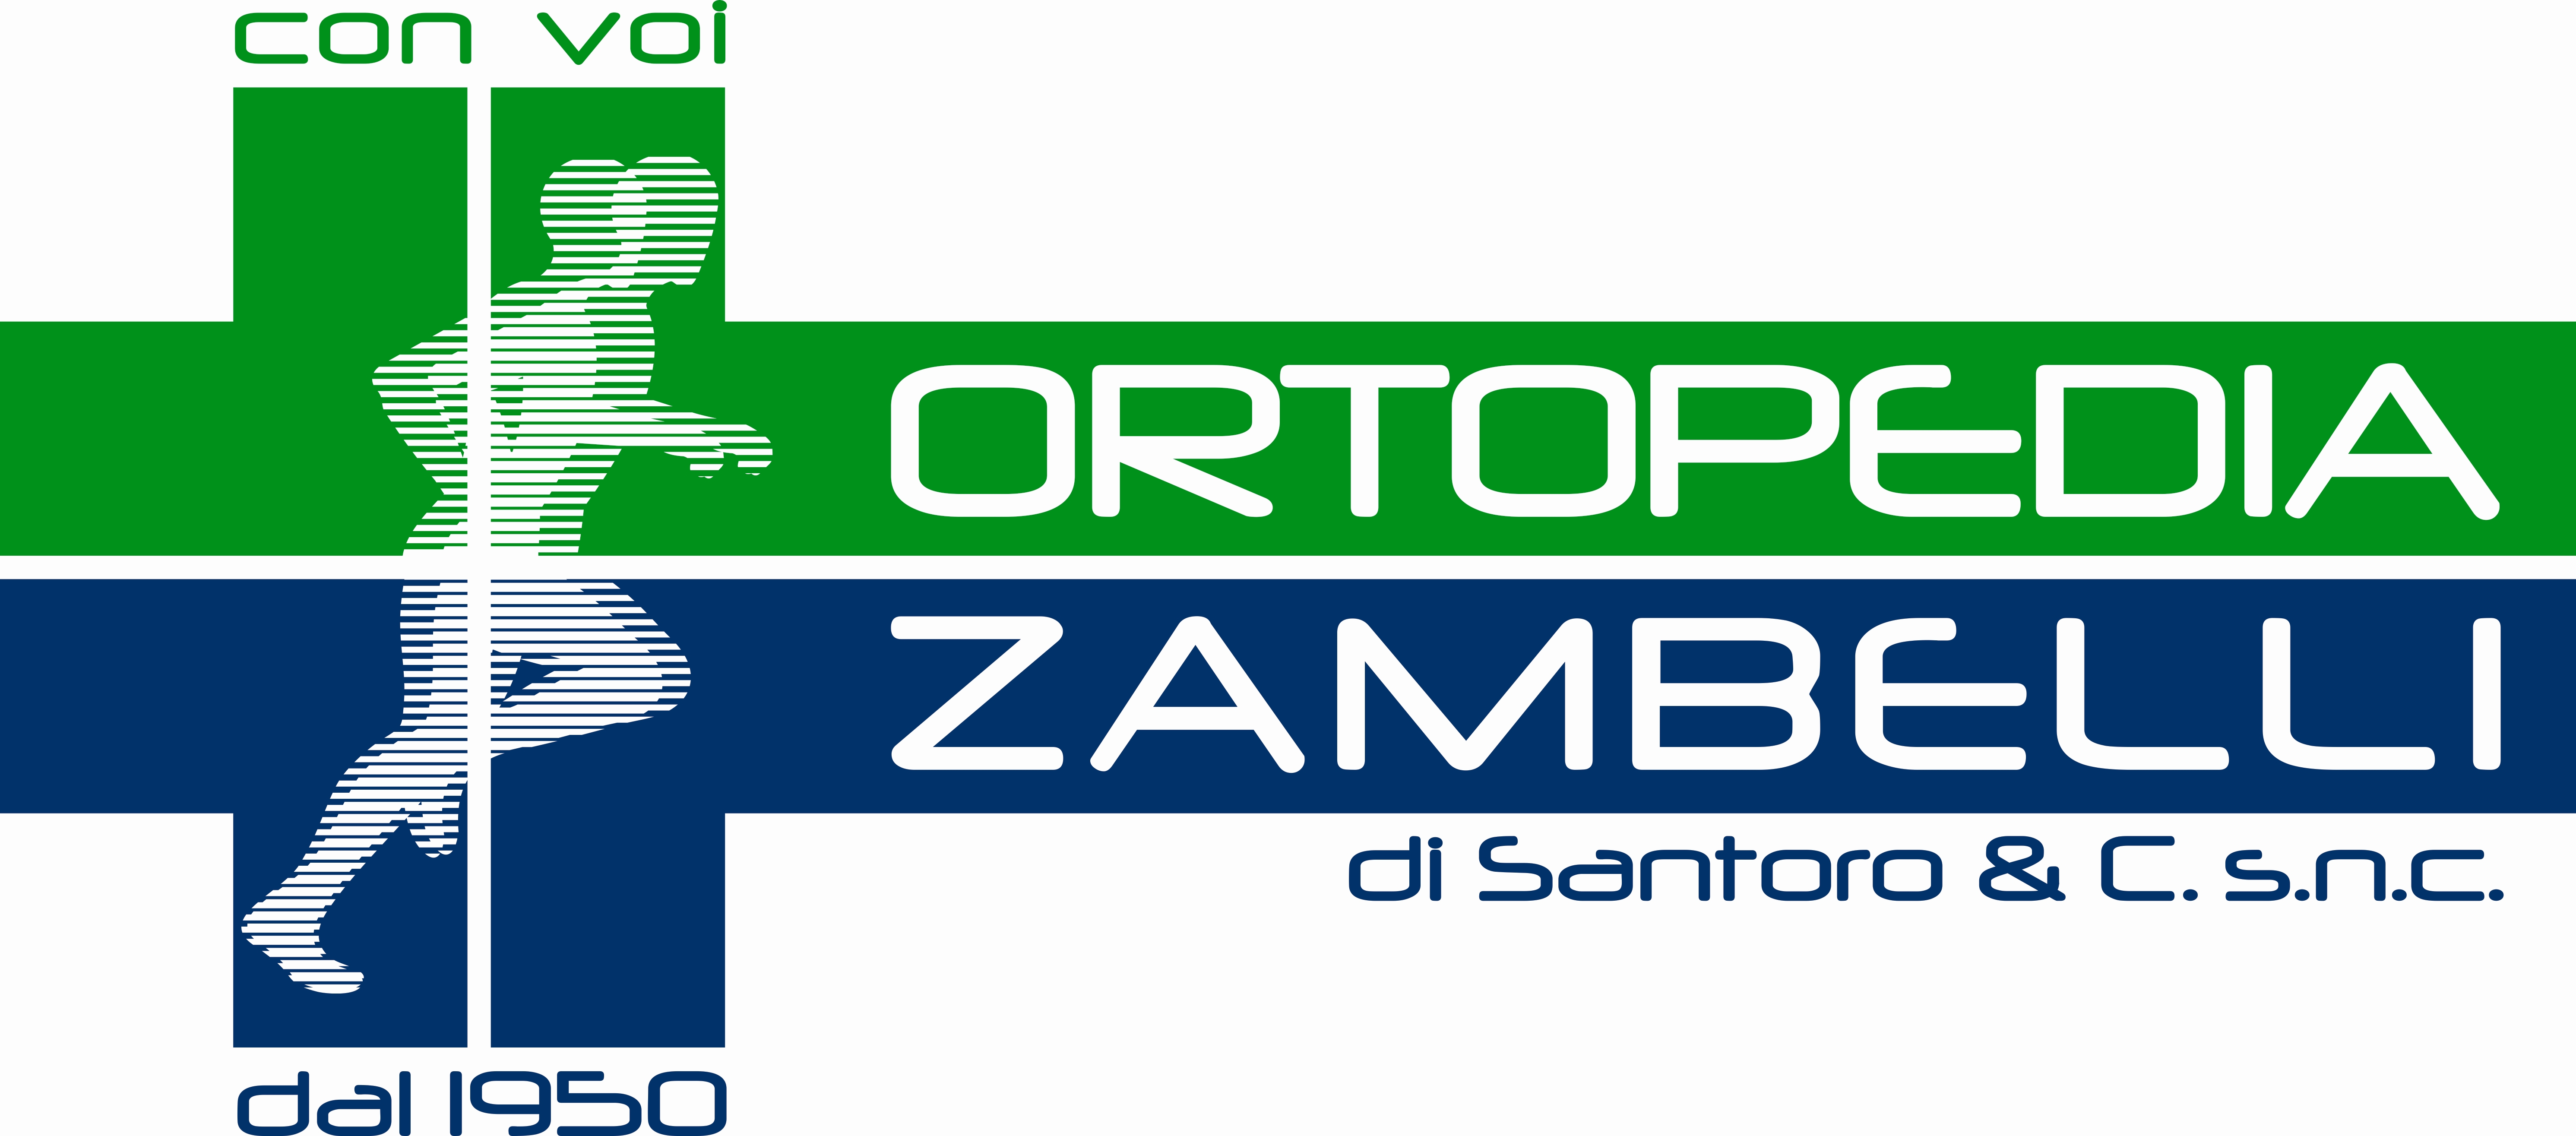 Ortopedia Zambelli